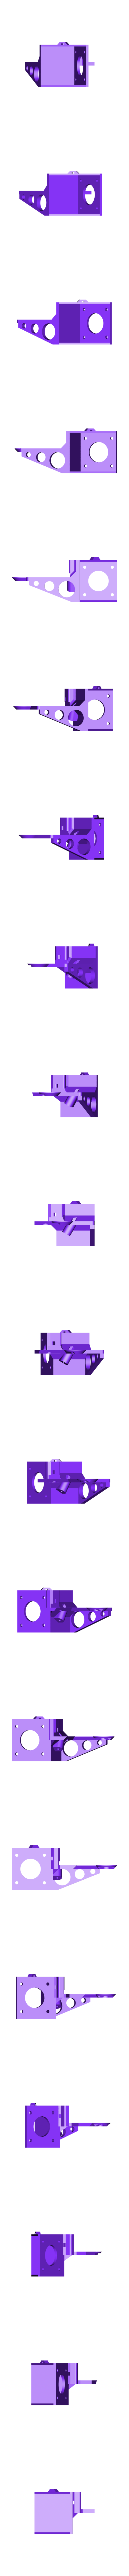 extrusor_suporte_furo_fita_aco_3.stl Download free STL file CR-10 or Mini to Prusa i3 conversion kit • 3D print design, aerofred